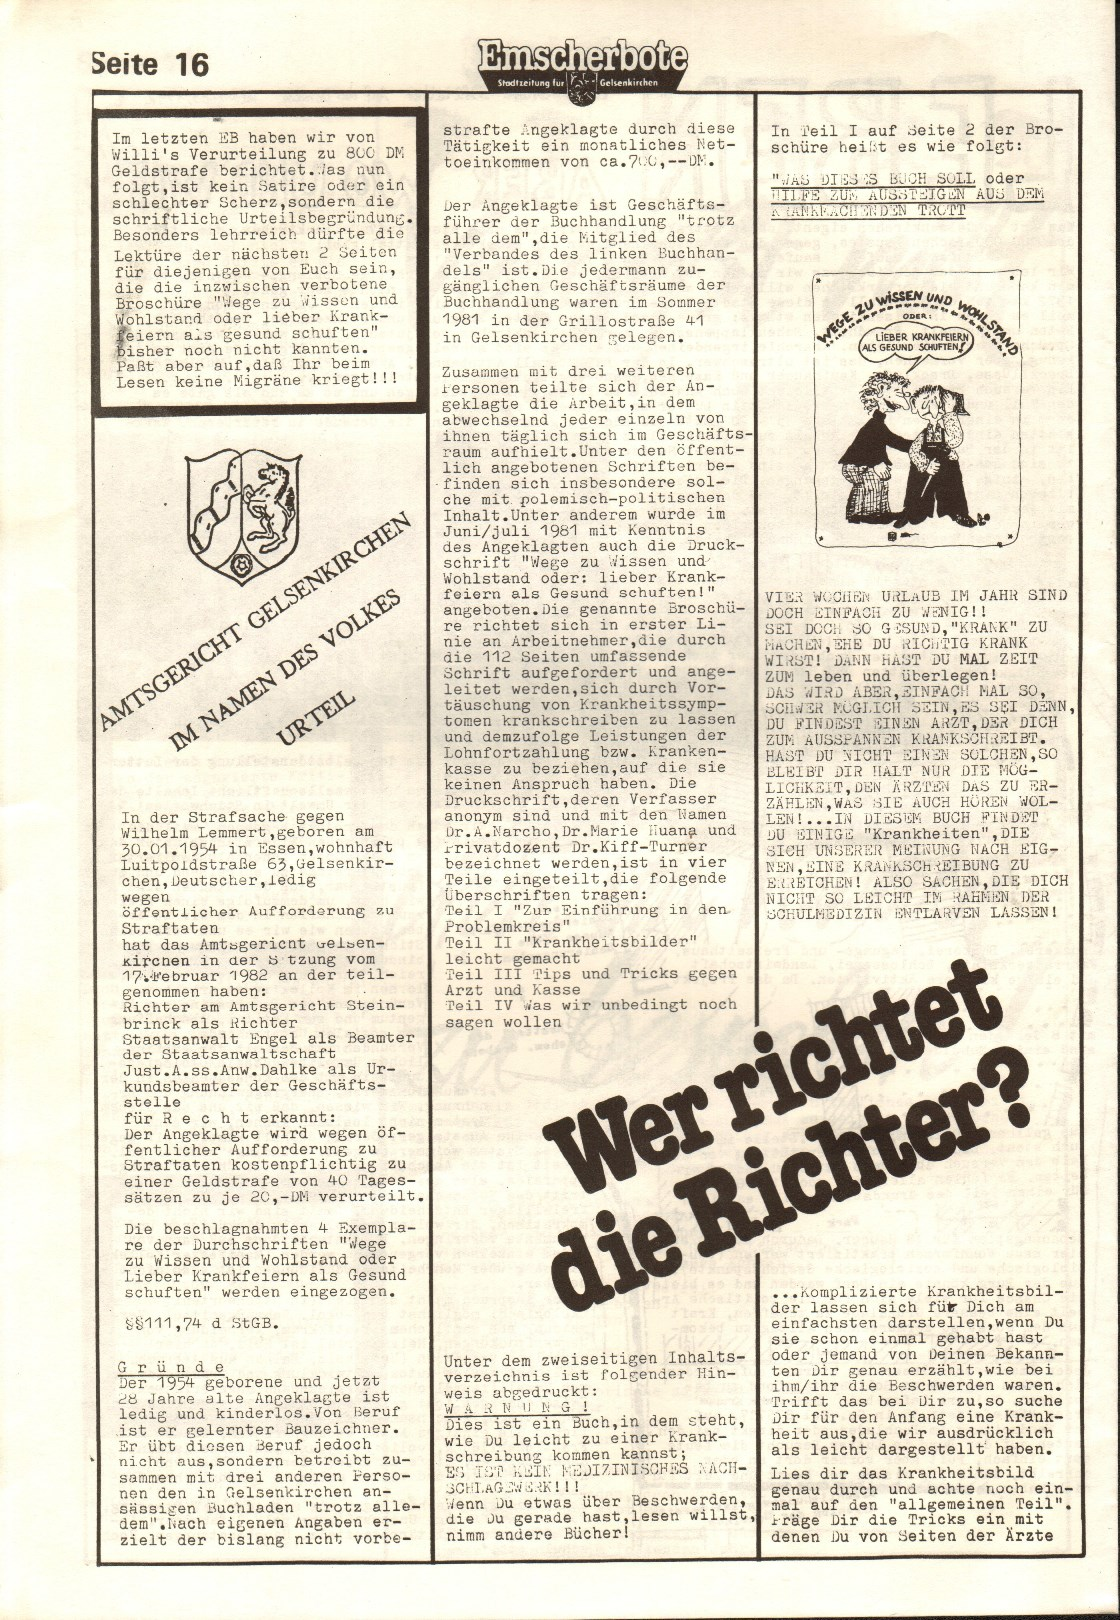 Gelsenkirchen_Emscherbote_1982_16_16